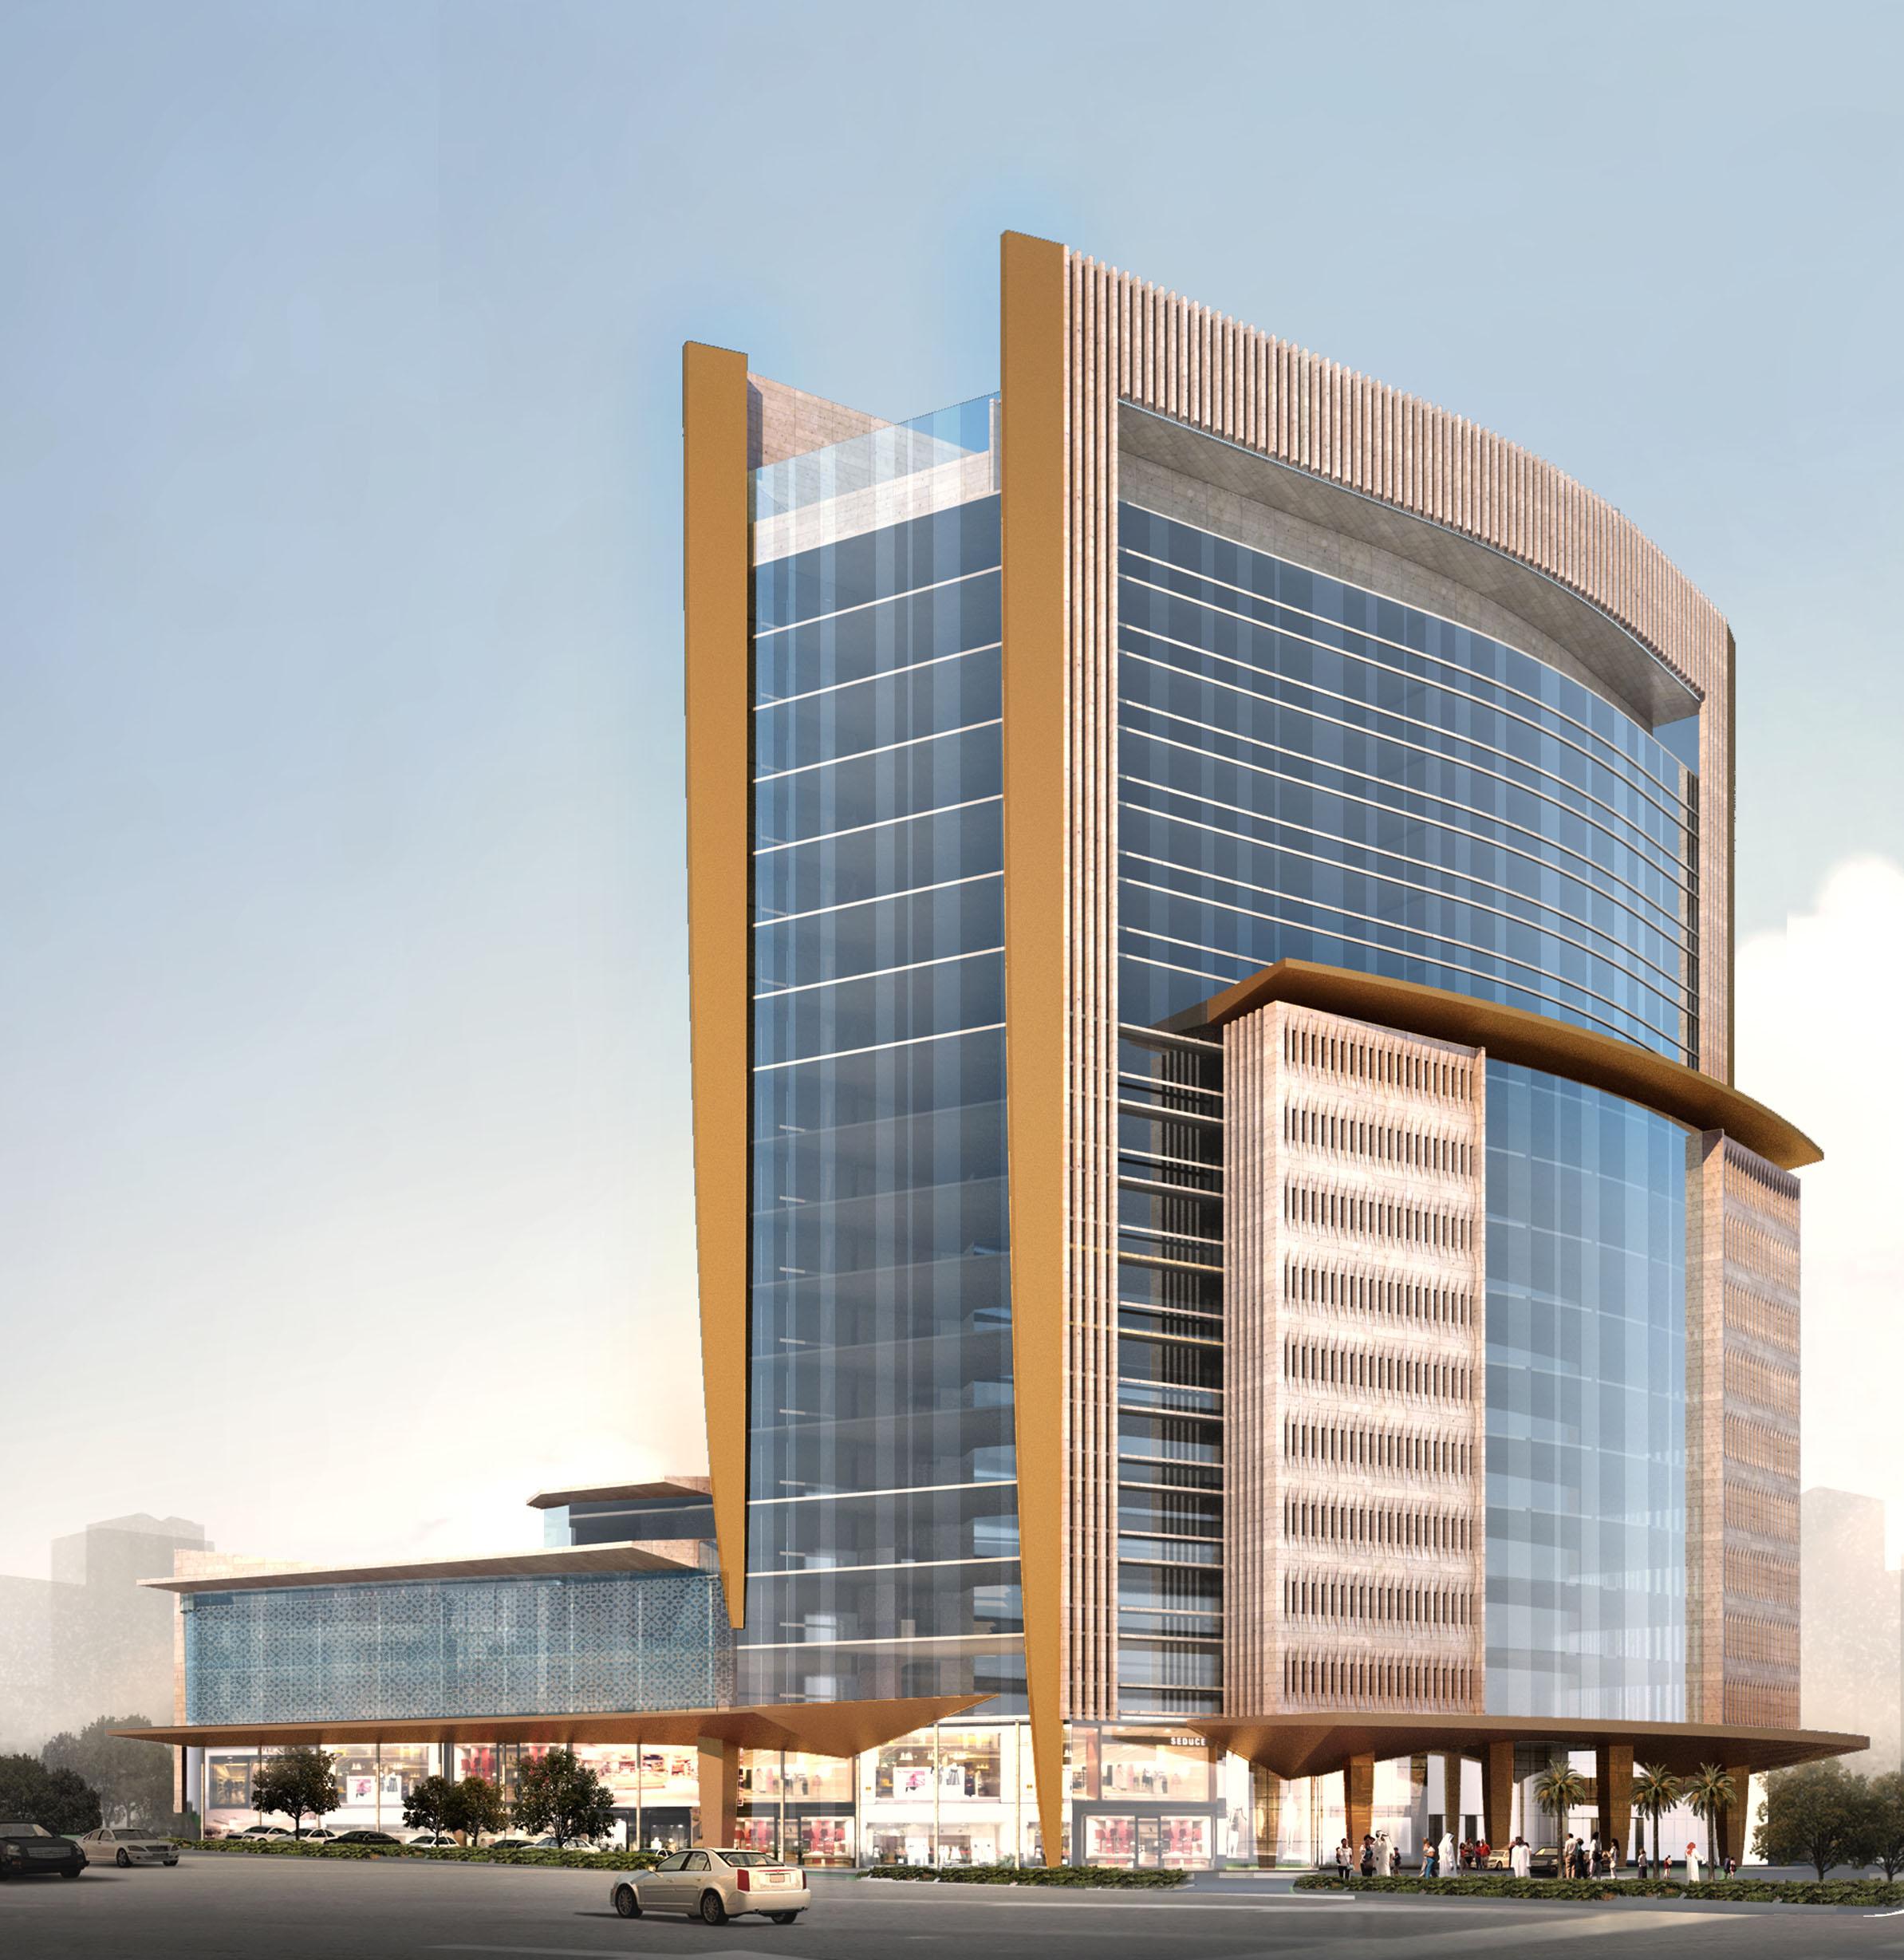 Radisson Blu Hotel, Riyad North Ring Road, Saudi-Arabien